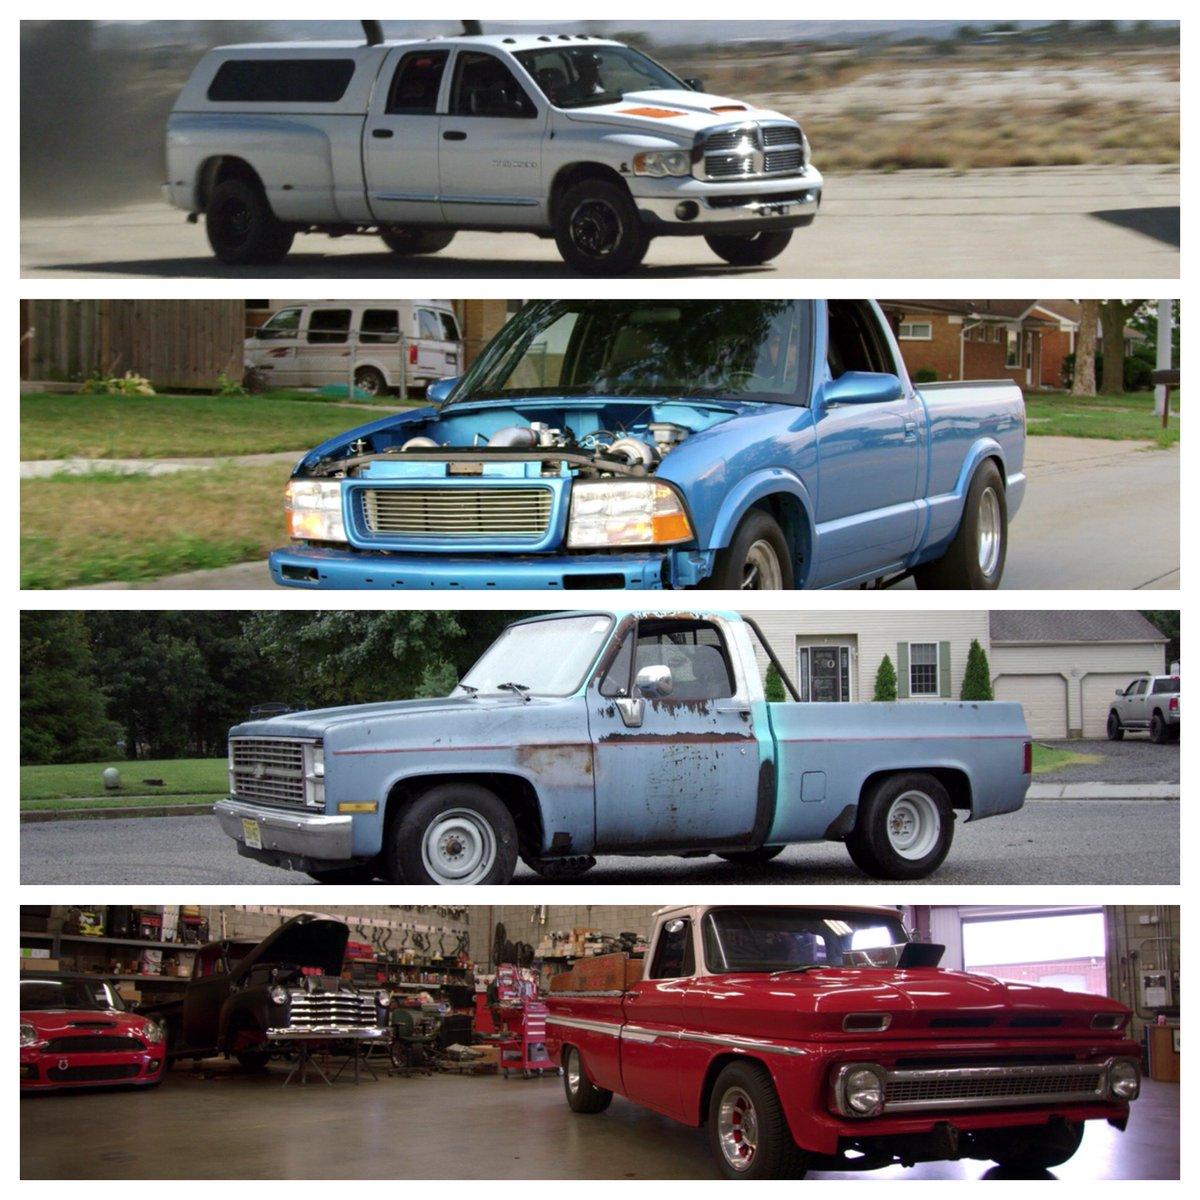 Fastest Diesel Truck >> Fastest Car Twitterissa Hey Fastestcar Fans It S Time To